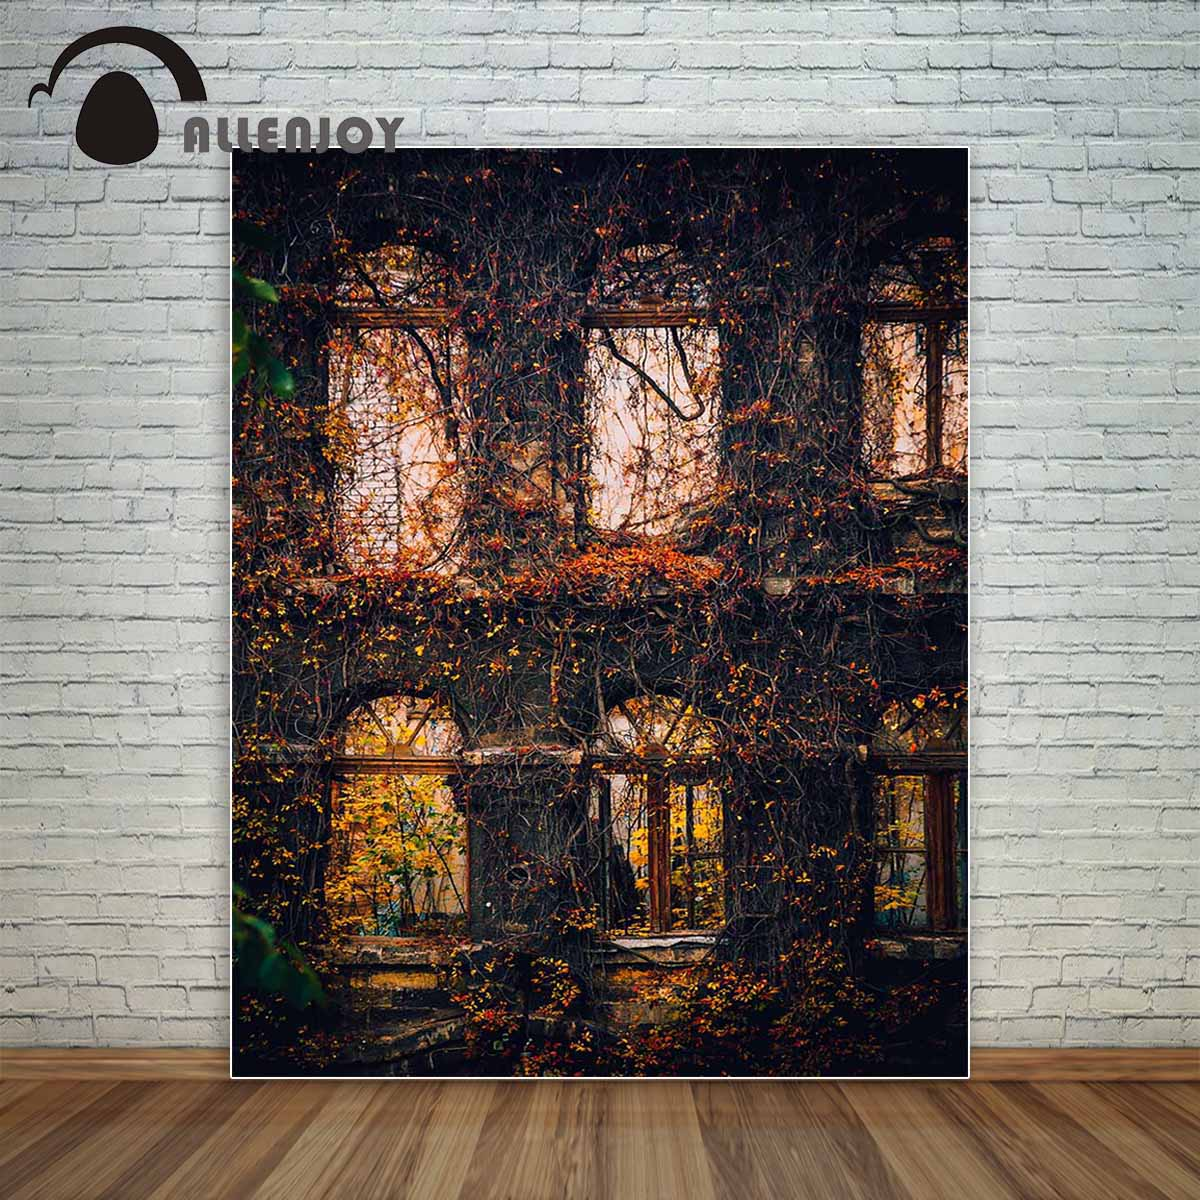 Allenjoy fotografia pano de fundo janelas moitas crescidas plantas outono vintage fundo novo design original para estúdio de fotos